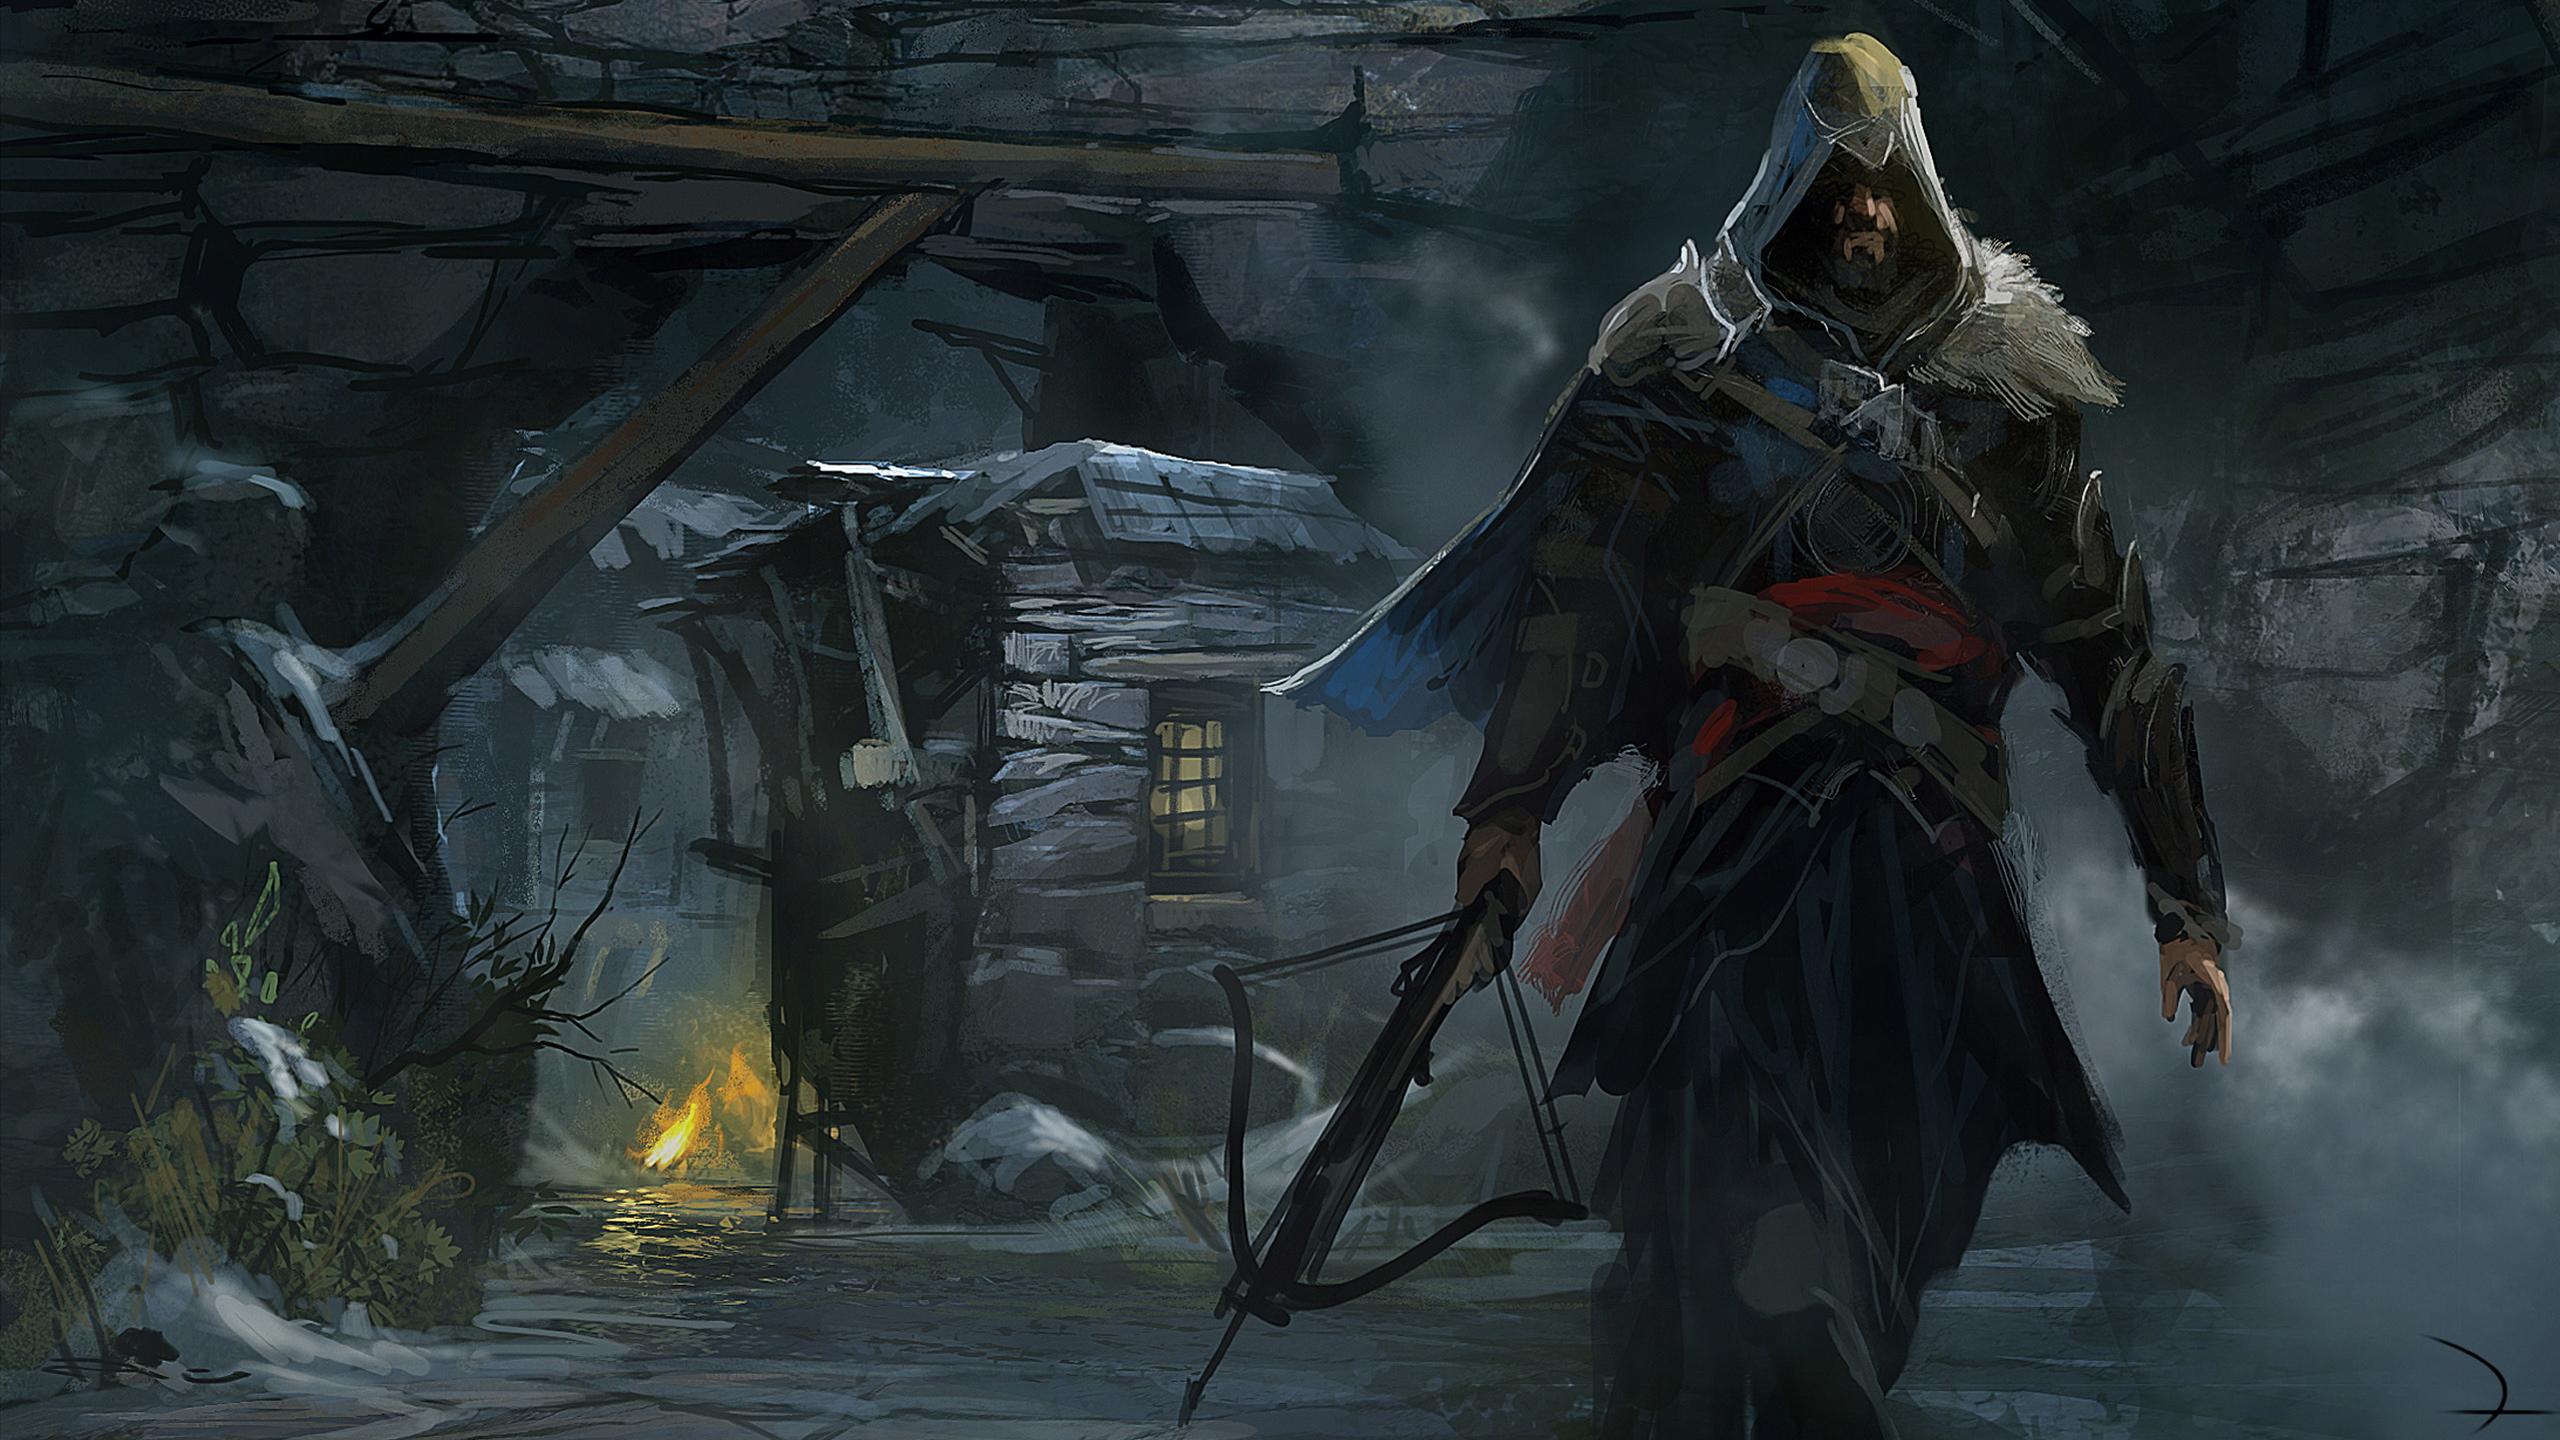 Assassin 39 s creed revelations hd wallpaper background image 2560x1440 id 284096 - Assasins wallpaper ...